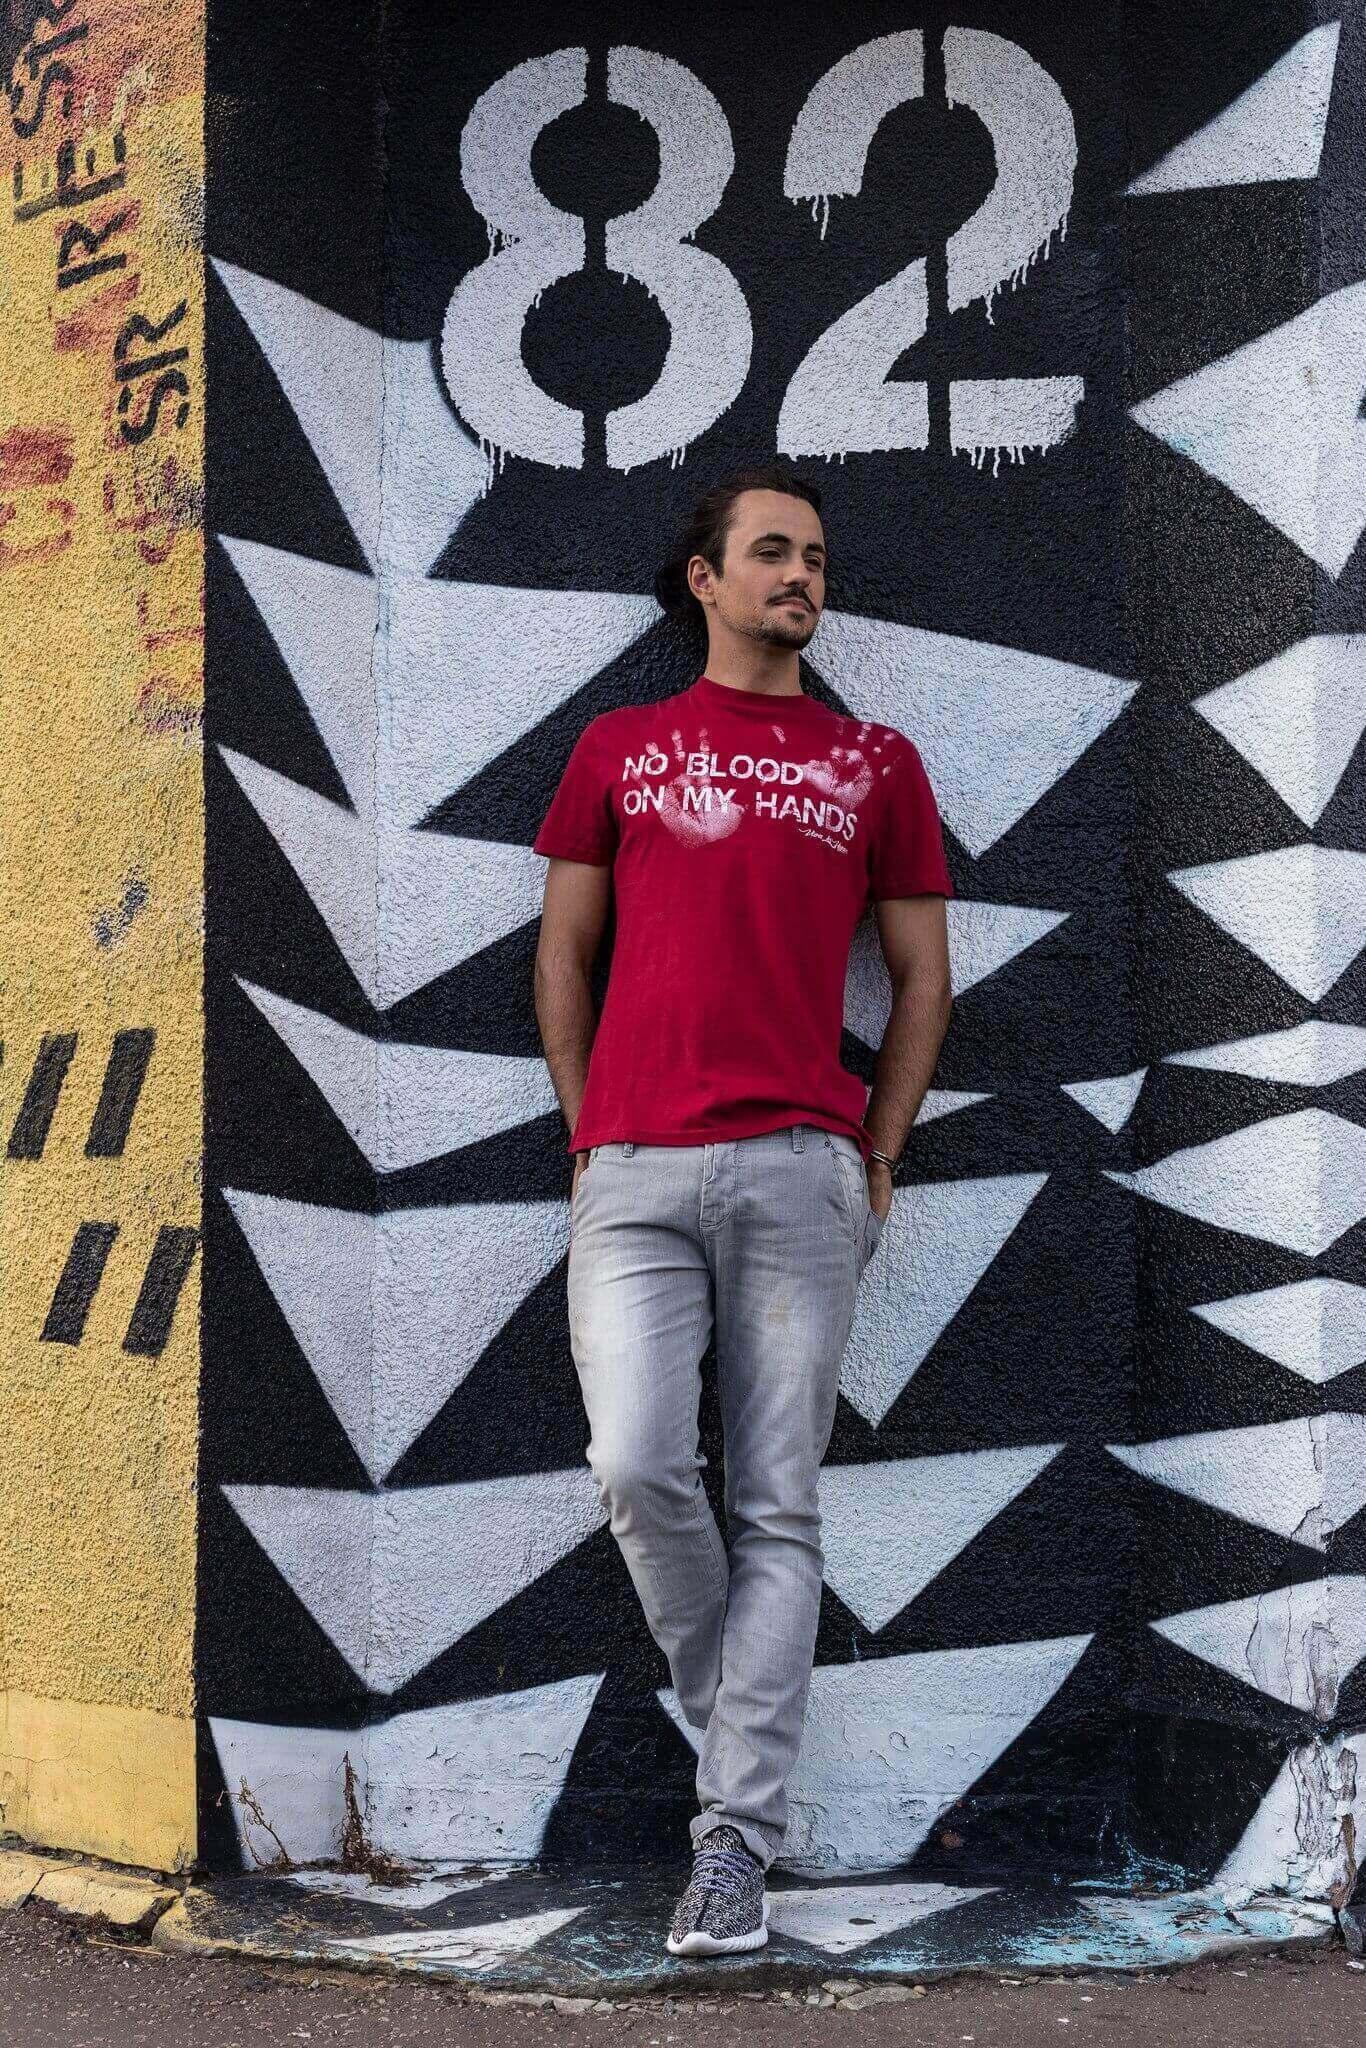 Unisex Vegan Tshirt : No Blood On My Hands